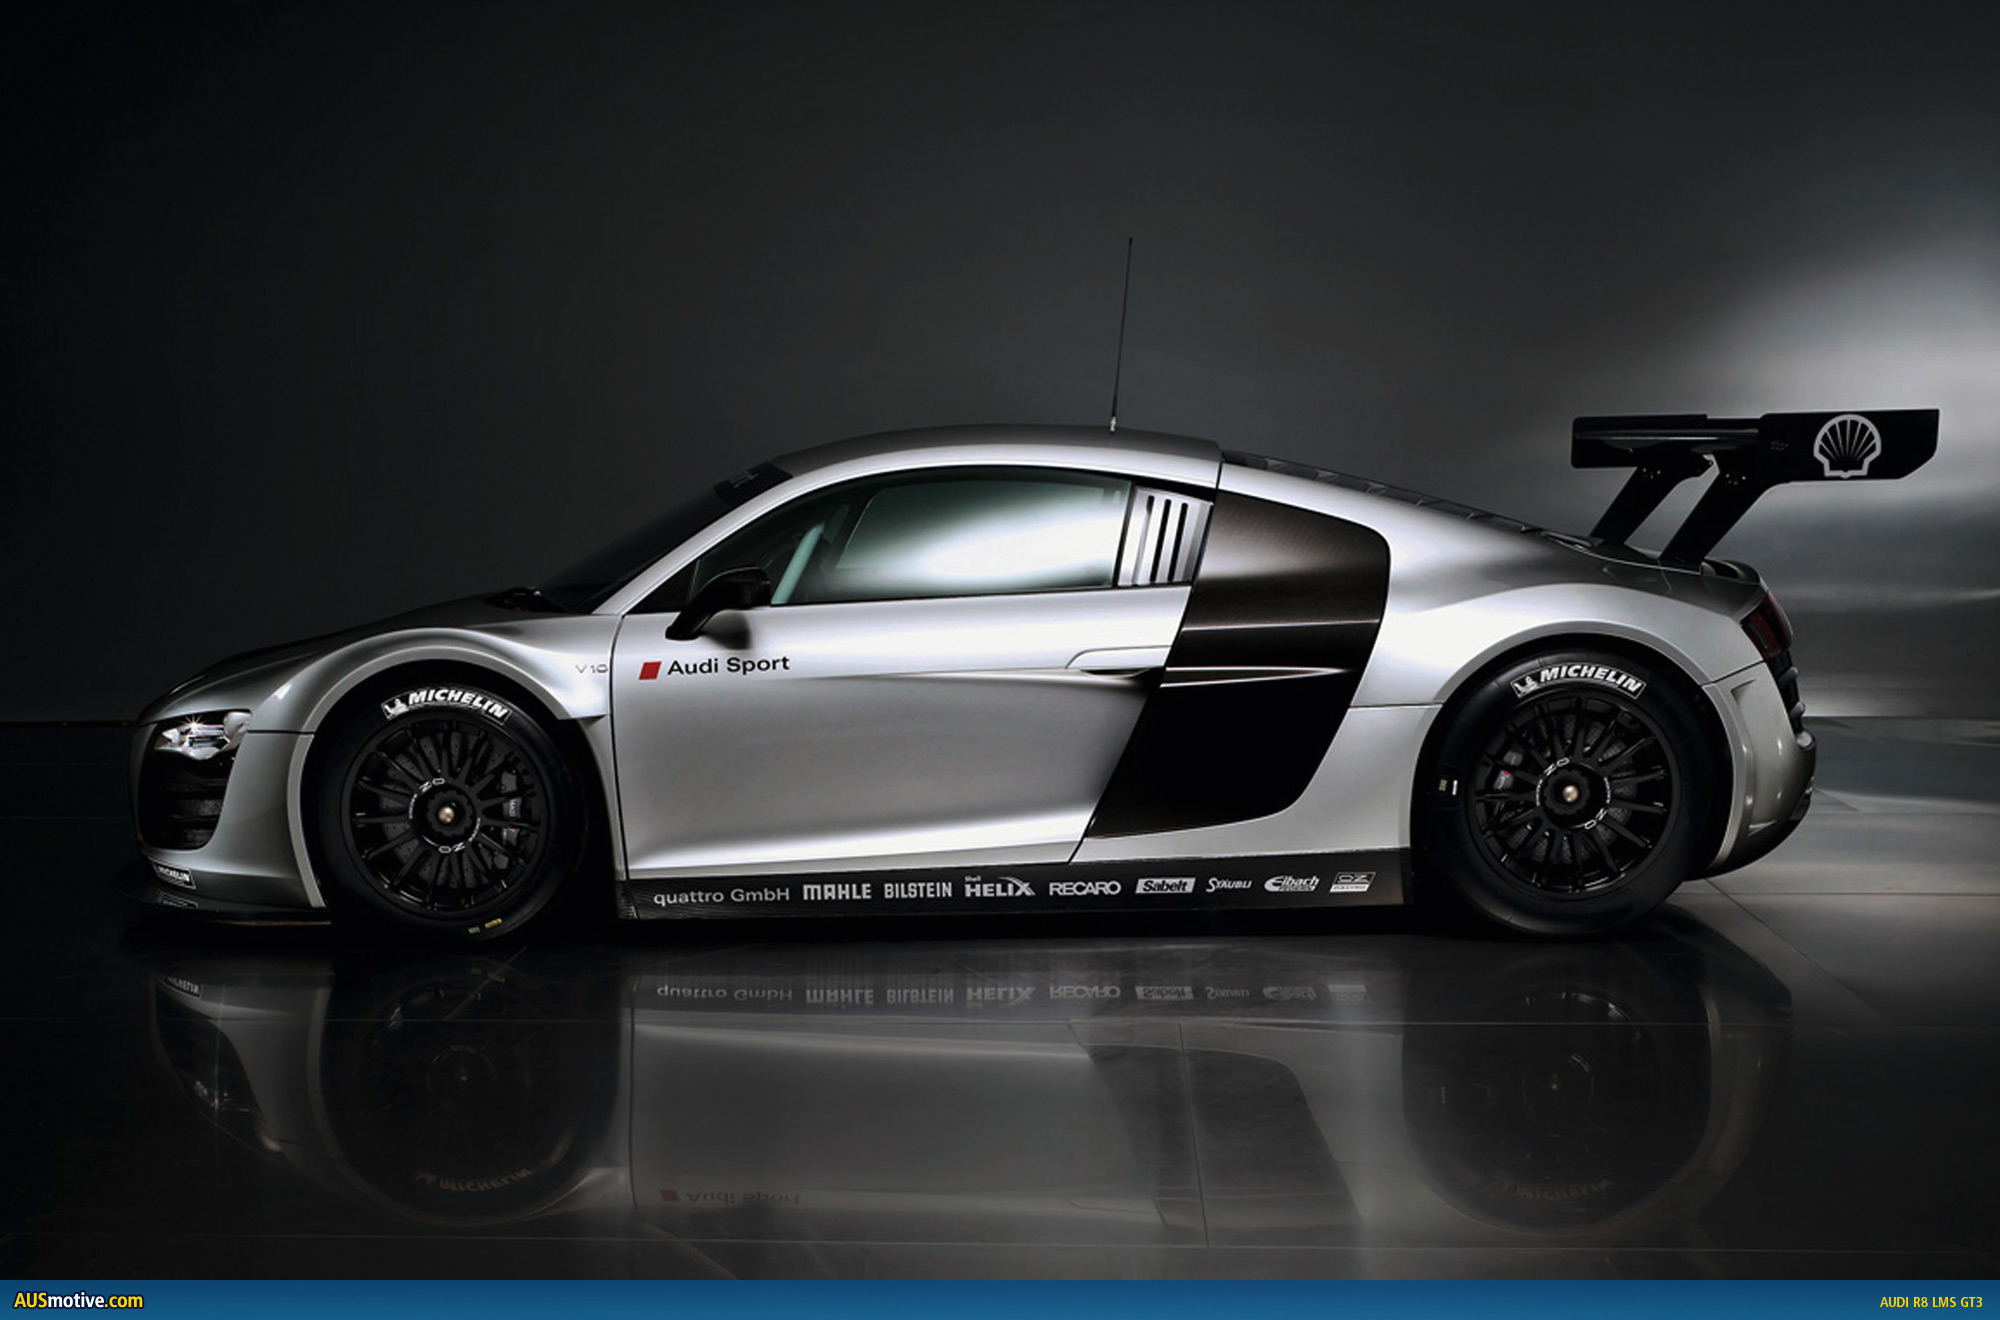 Mercedes Amg Hypercar >> AUSmotive.com » Audi considers road-going R8 GT3 hypercar